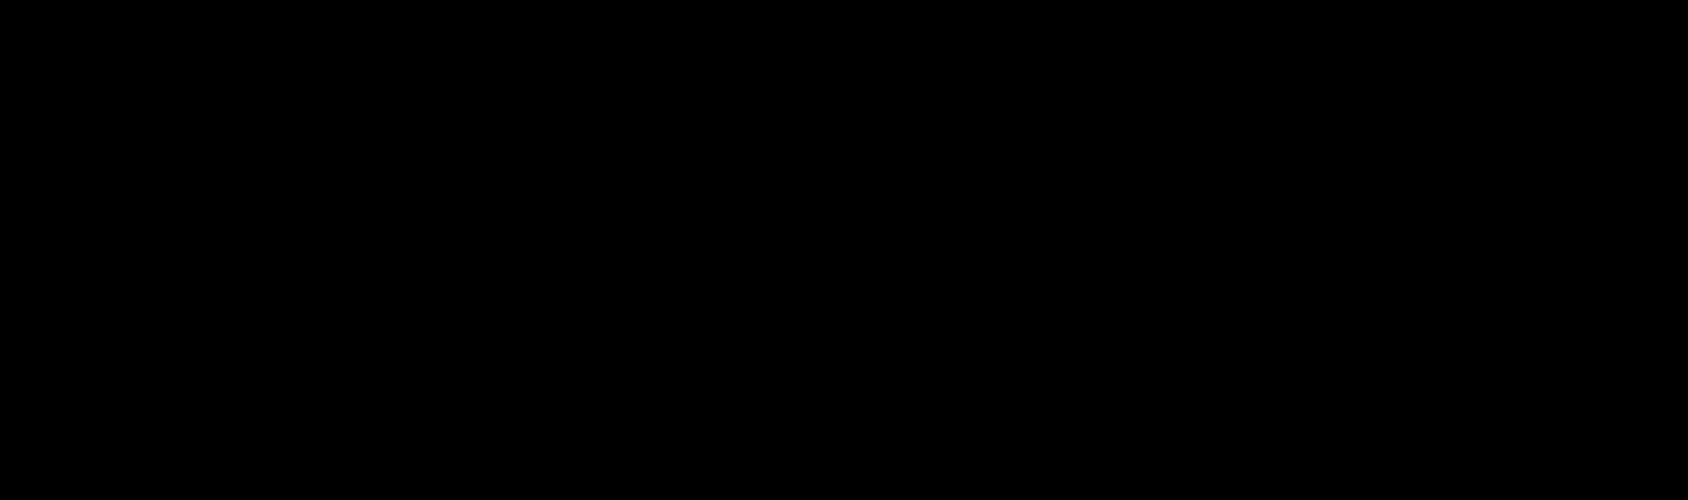 Firma_Completa Black Leyla